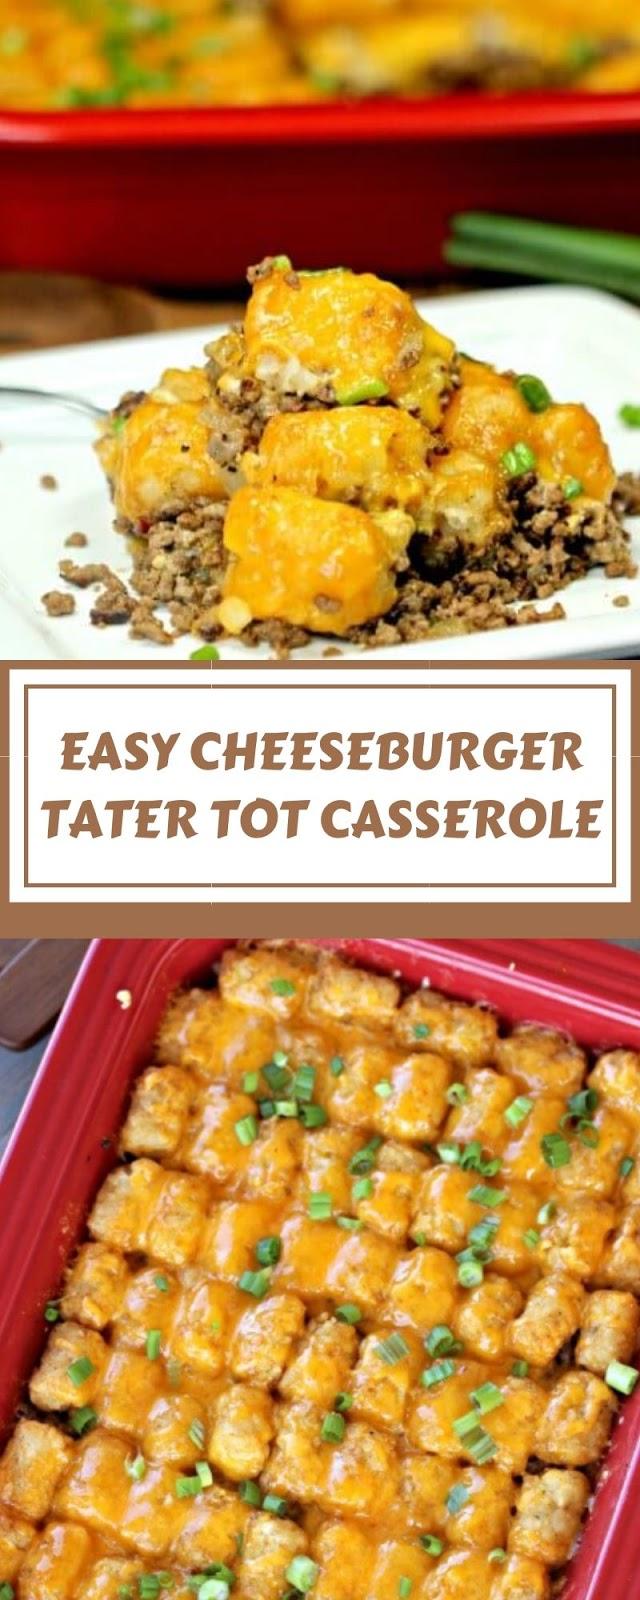 EASY CHEESEBURGER TATER TOT CASSEROLE